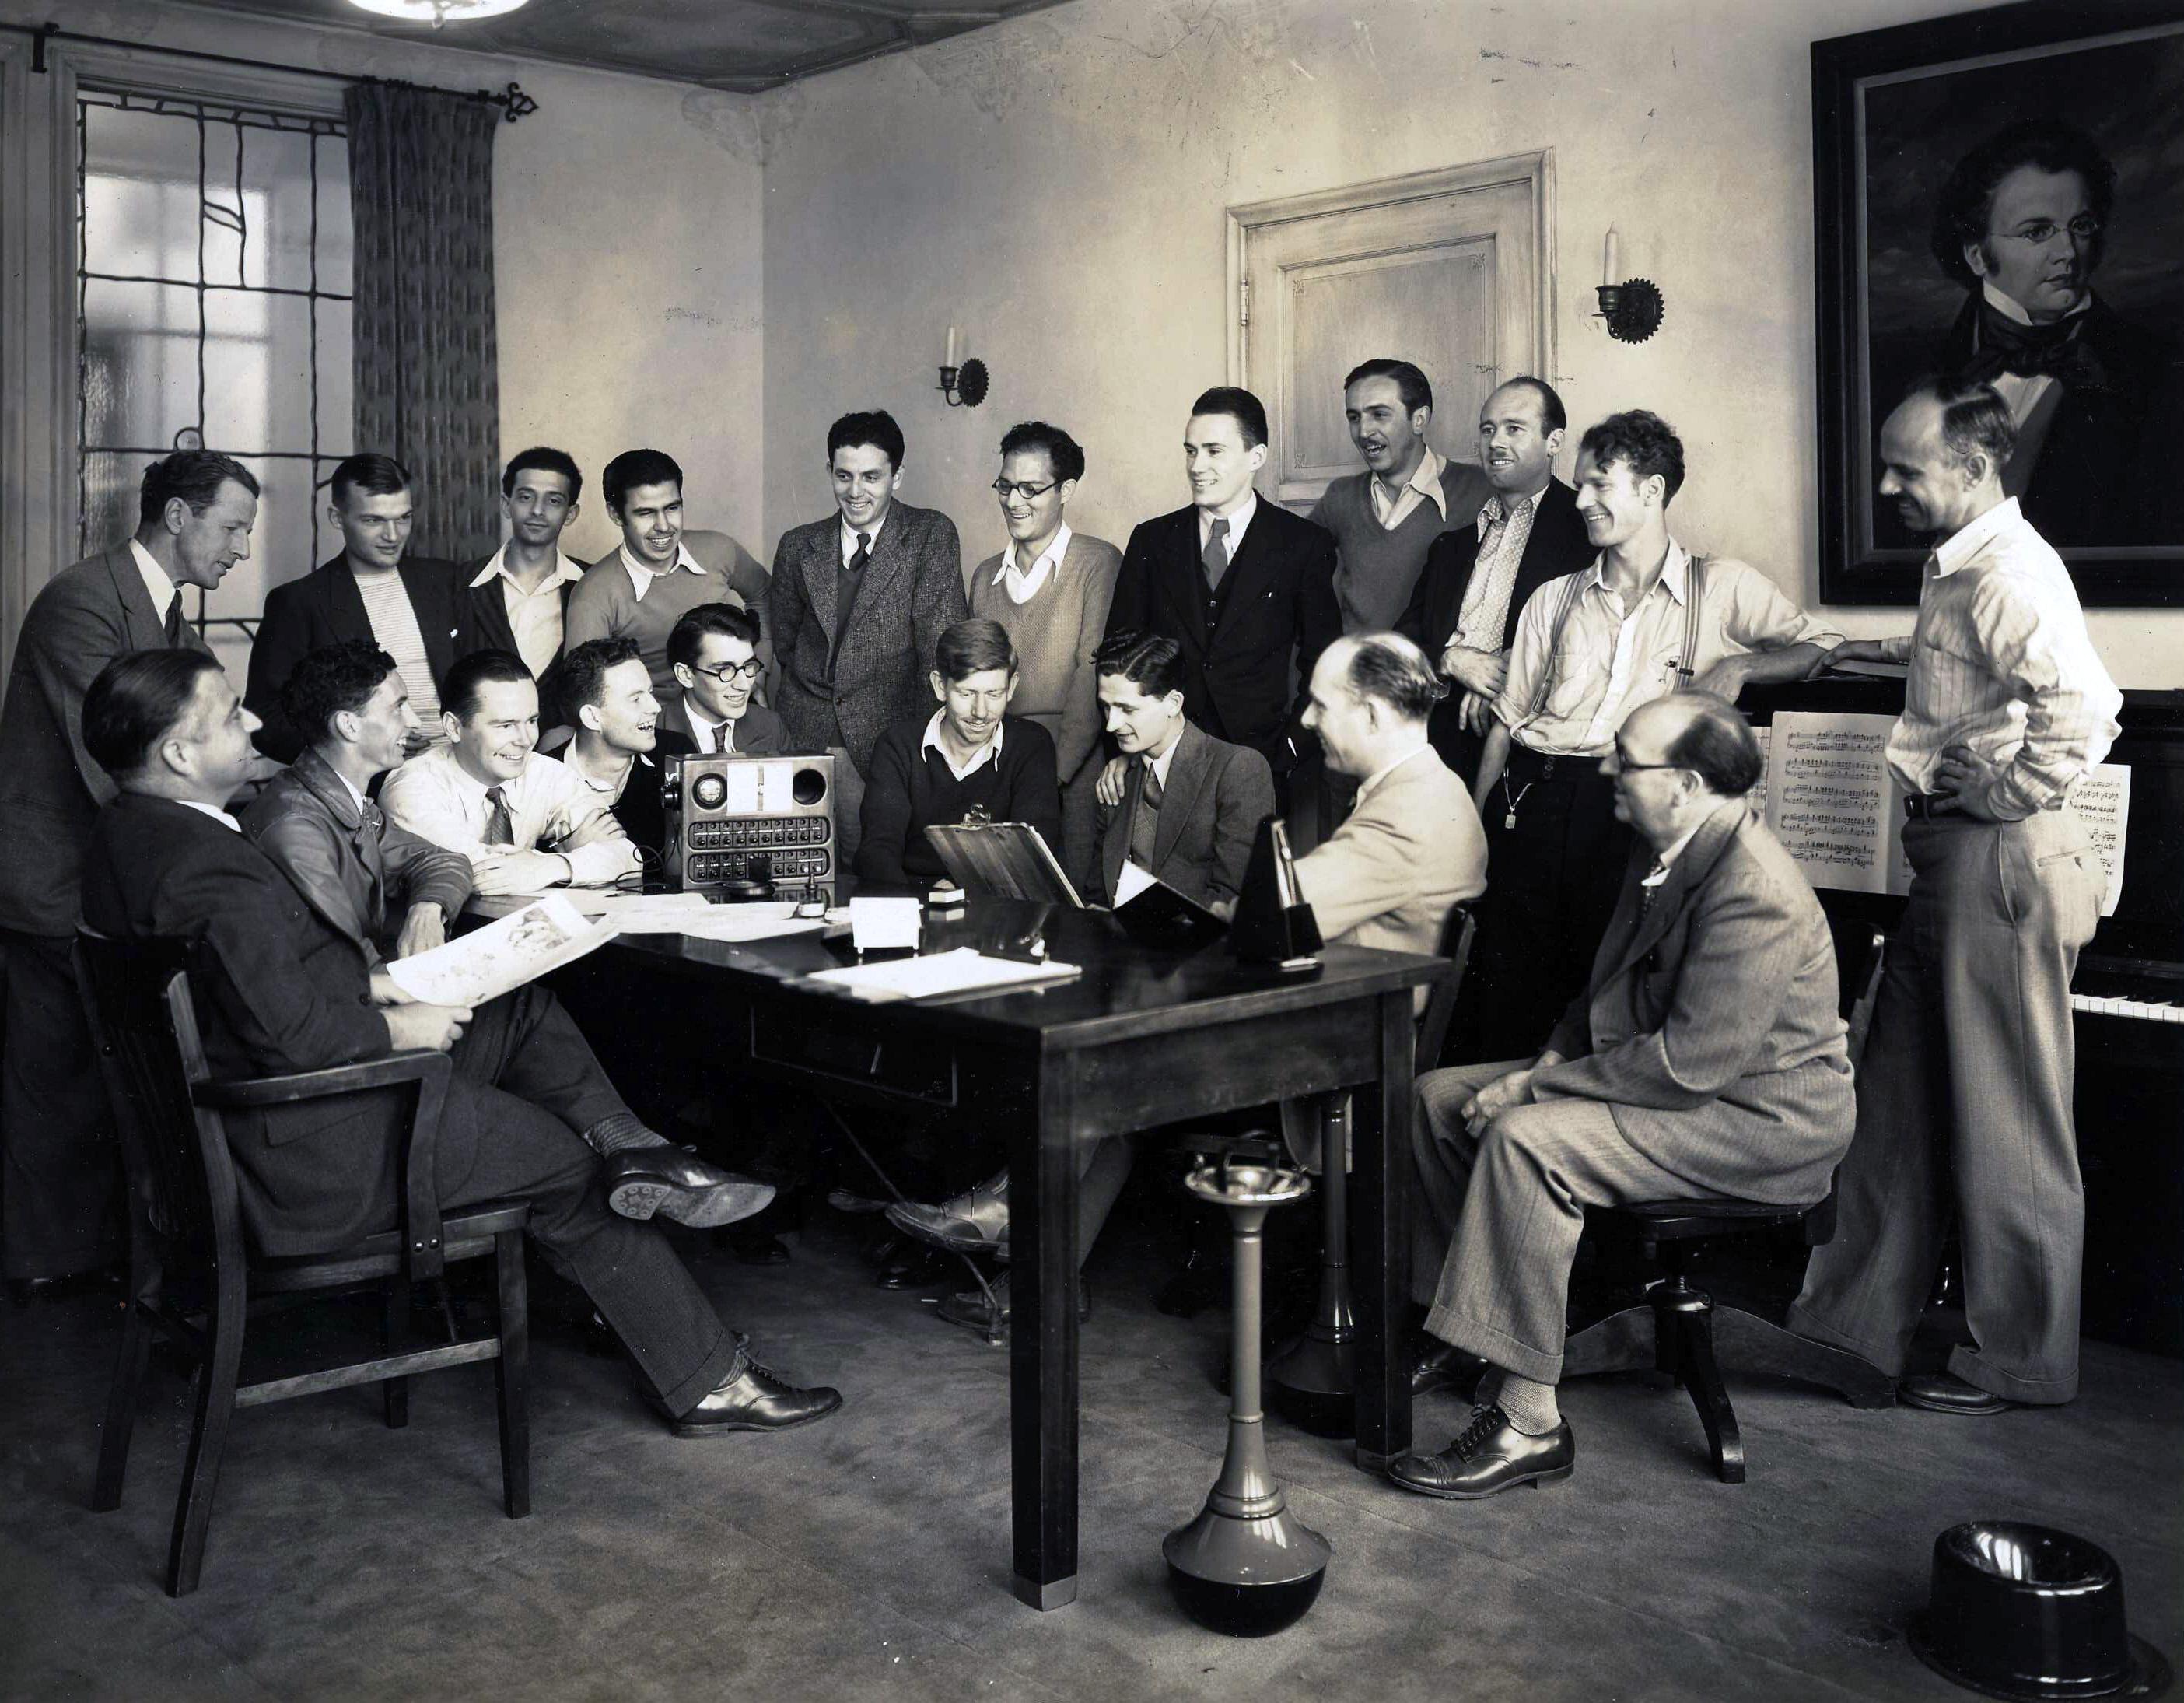 Walt disney biography essay